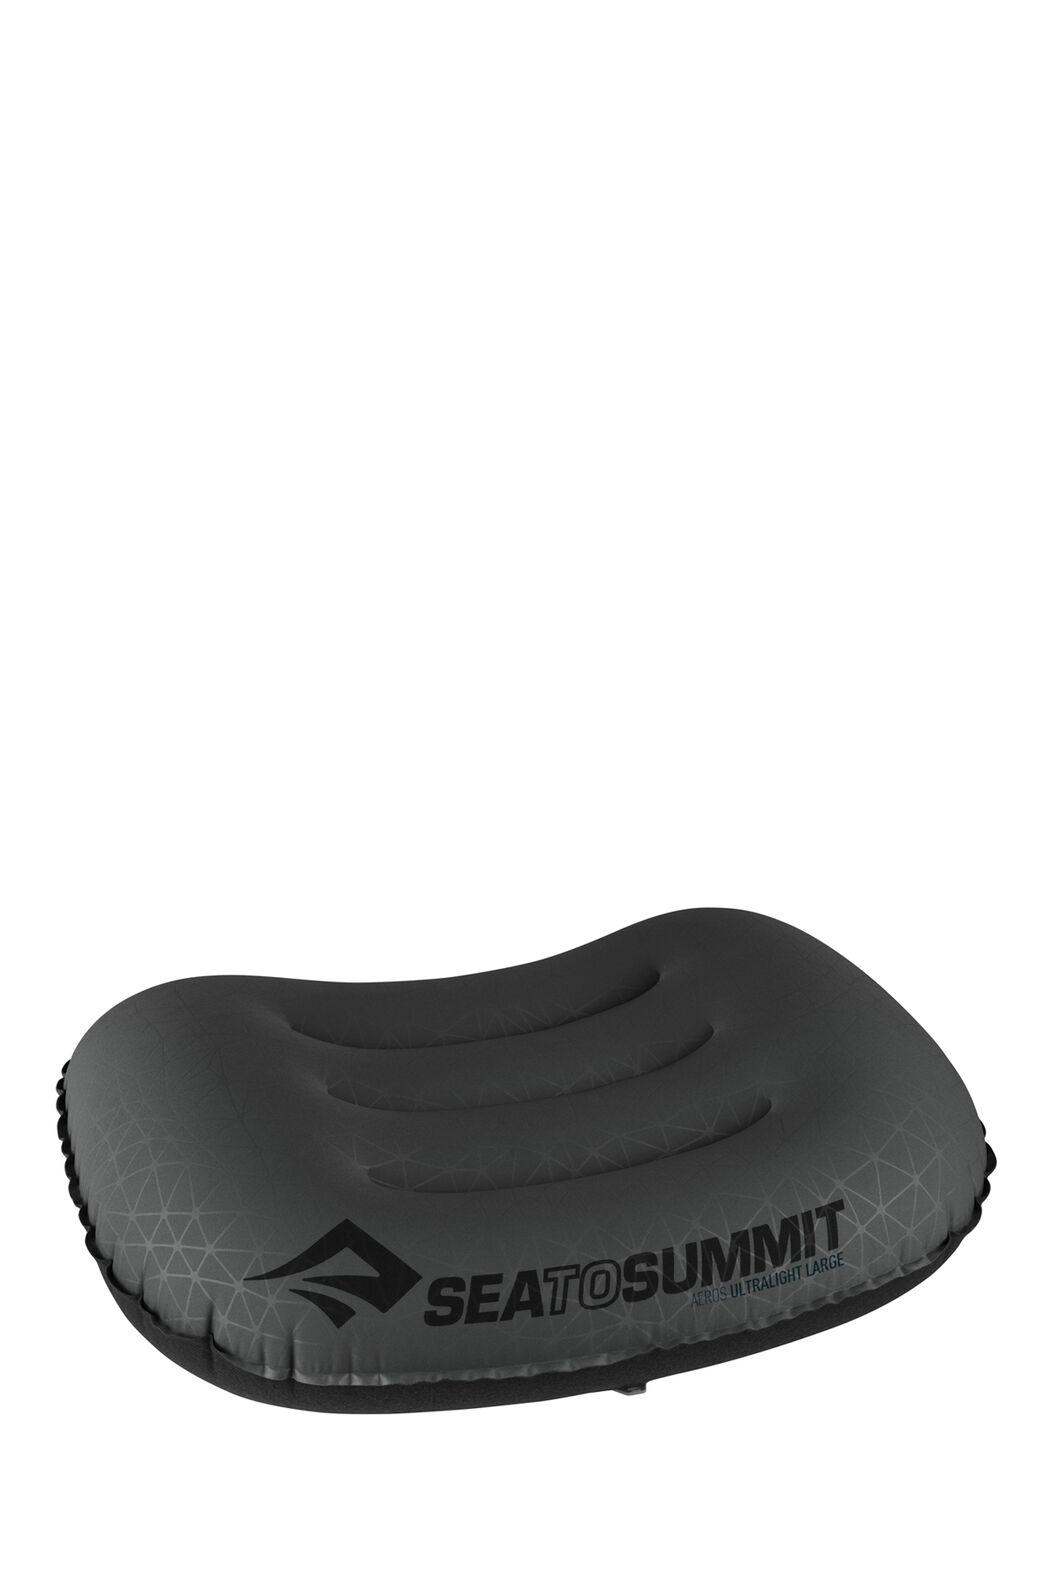 Sea to Summit Aeros Ultralight Pillow — Large, Grey, hi-res